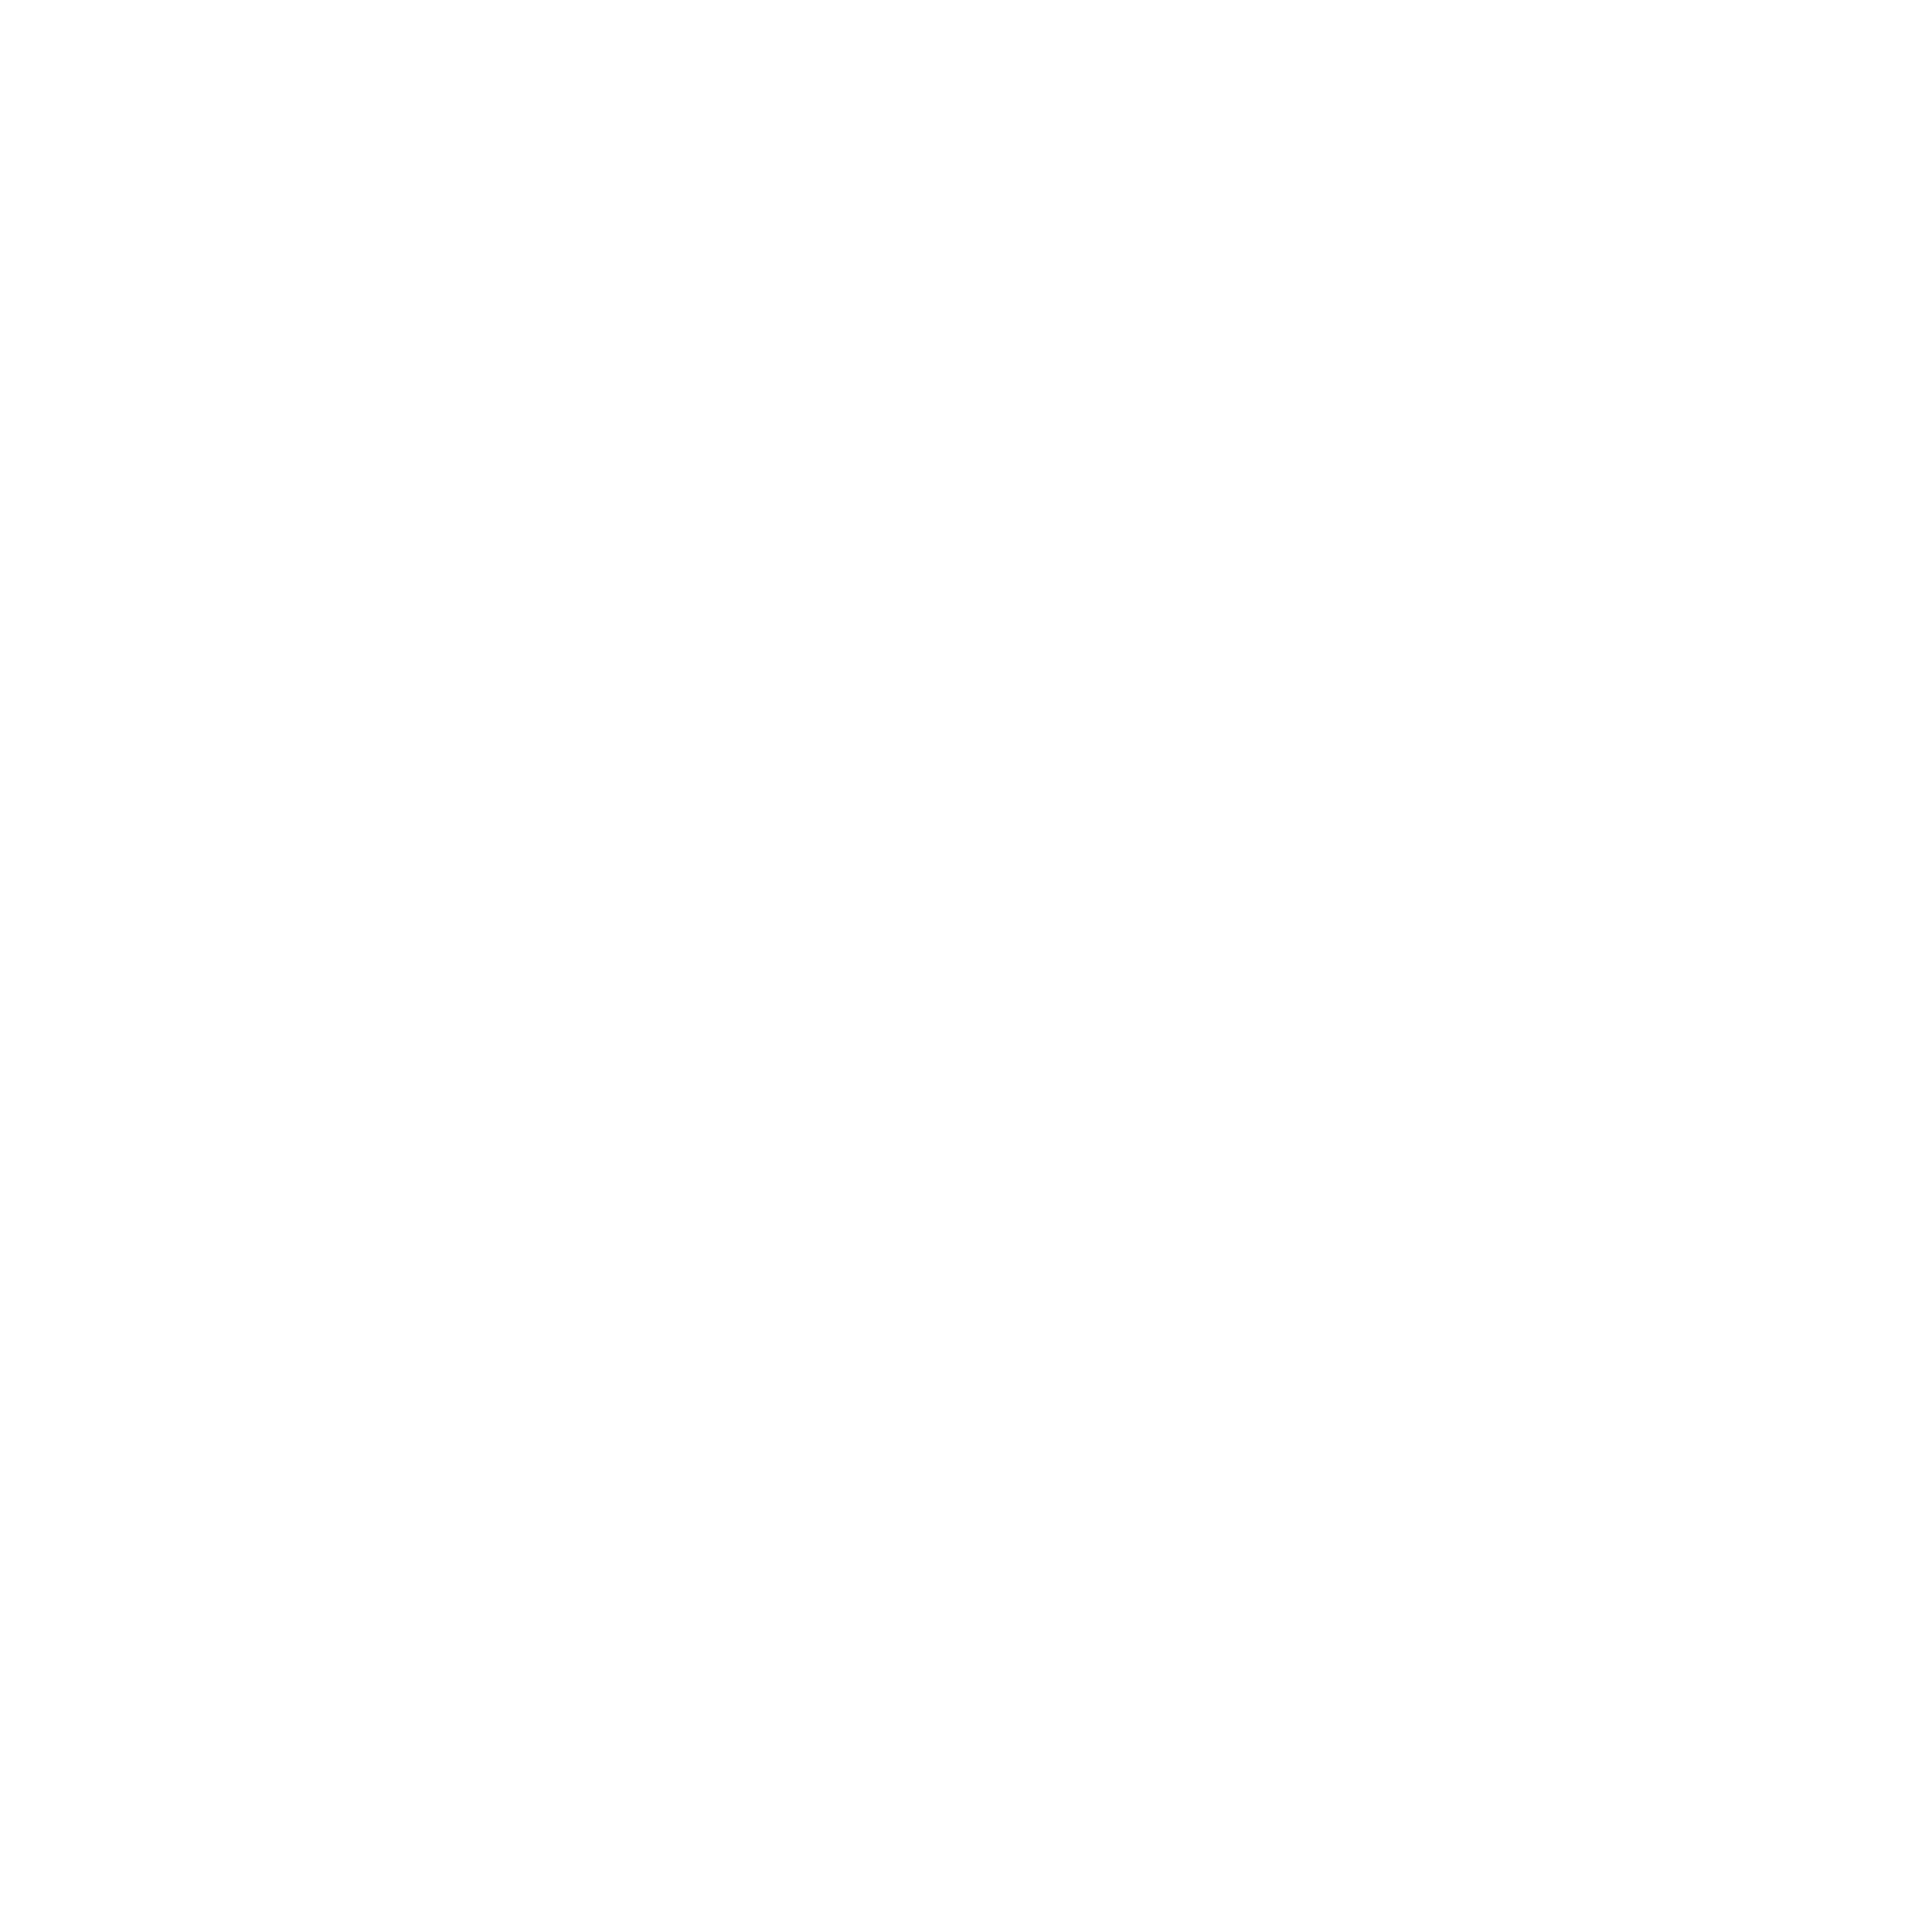 Traditional Acupuncture Plus